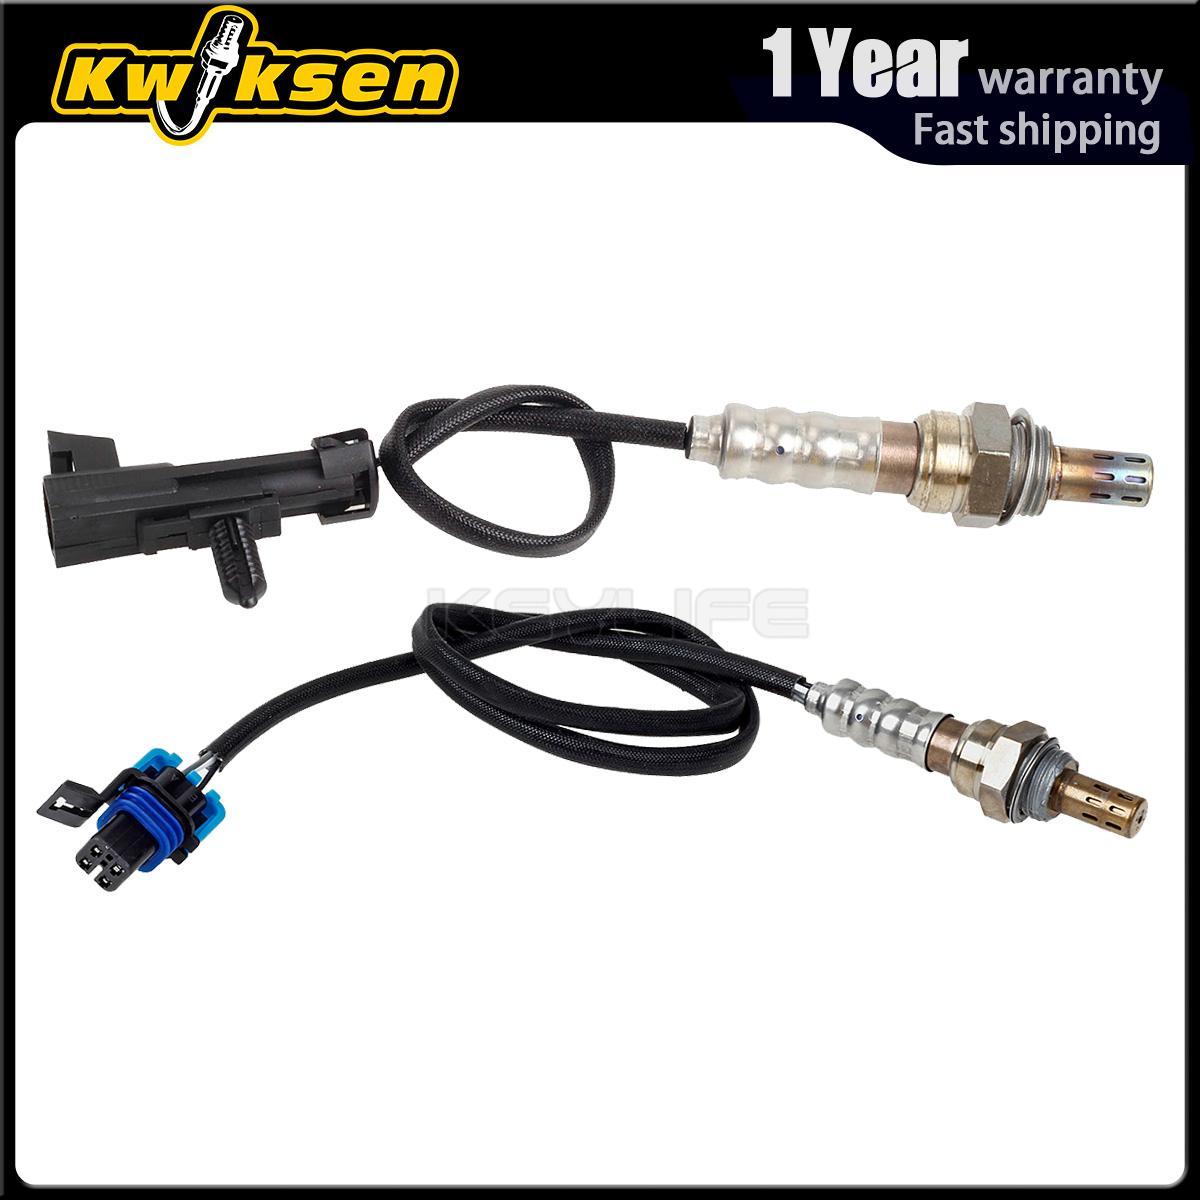 2pcs upstream+Downstream Oxygen Sensor for 00-02 Saturn SL SL1 SL2 SC1 SC2 1.9L